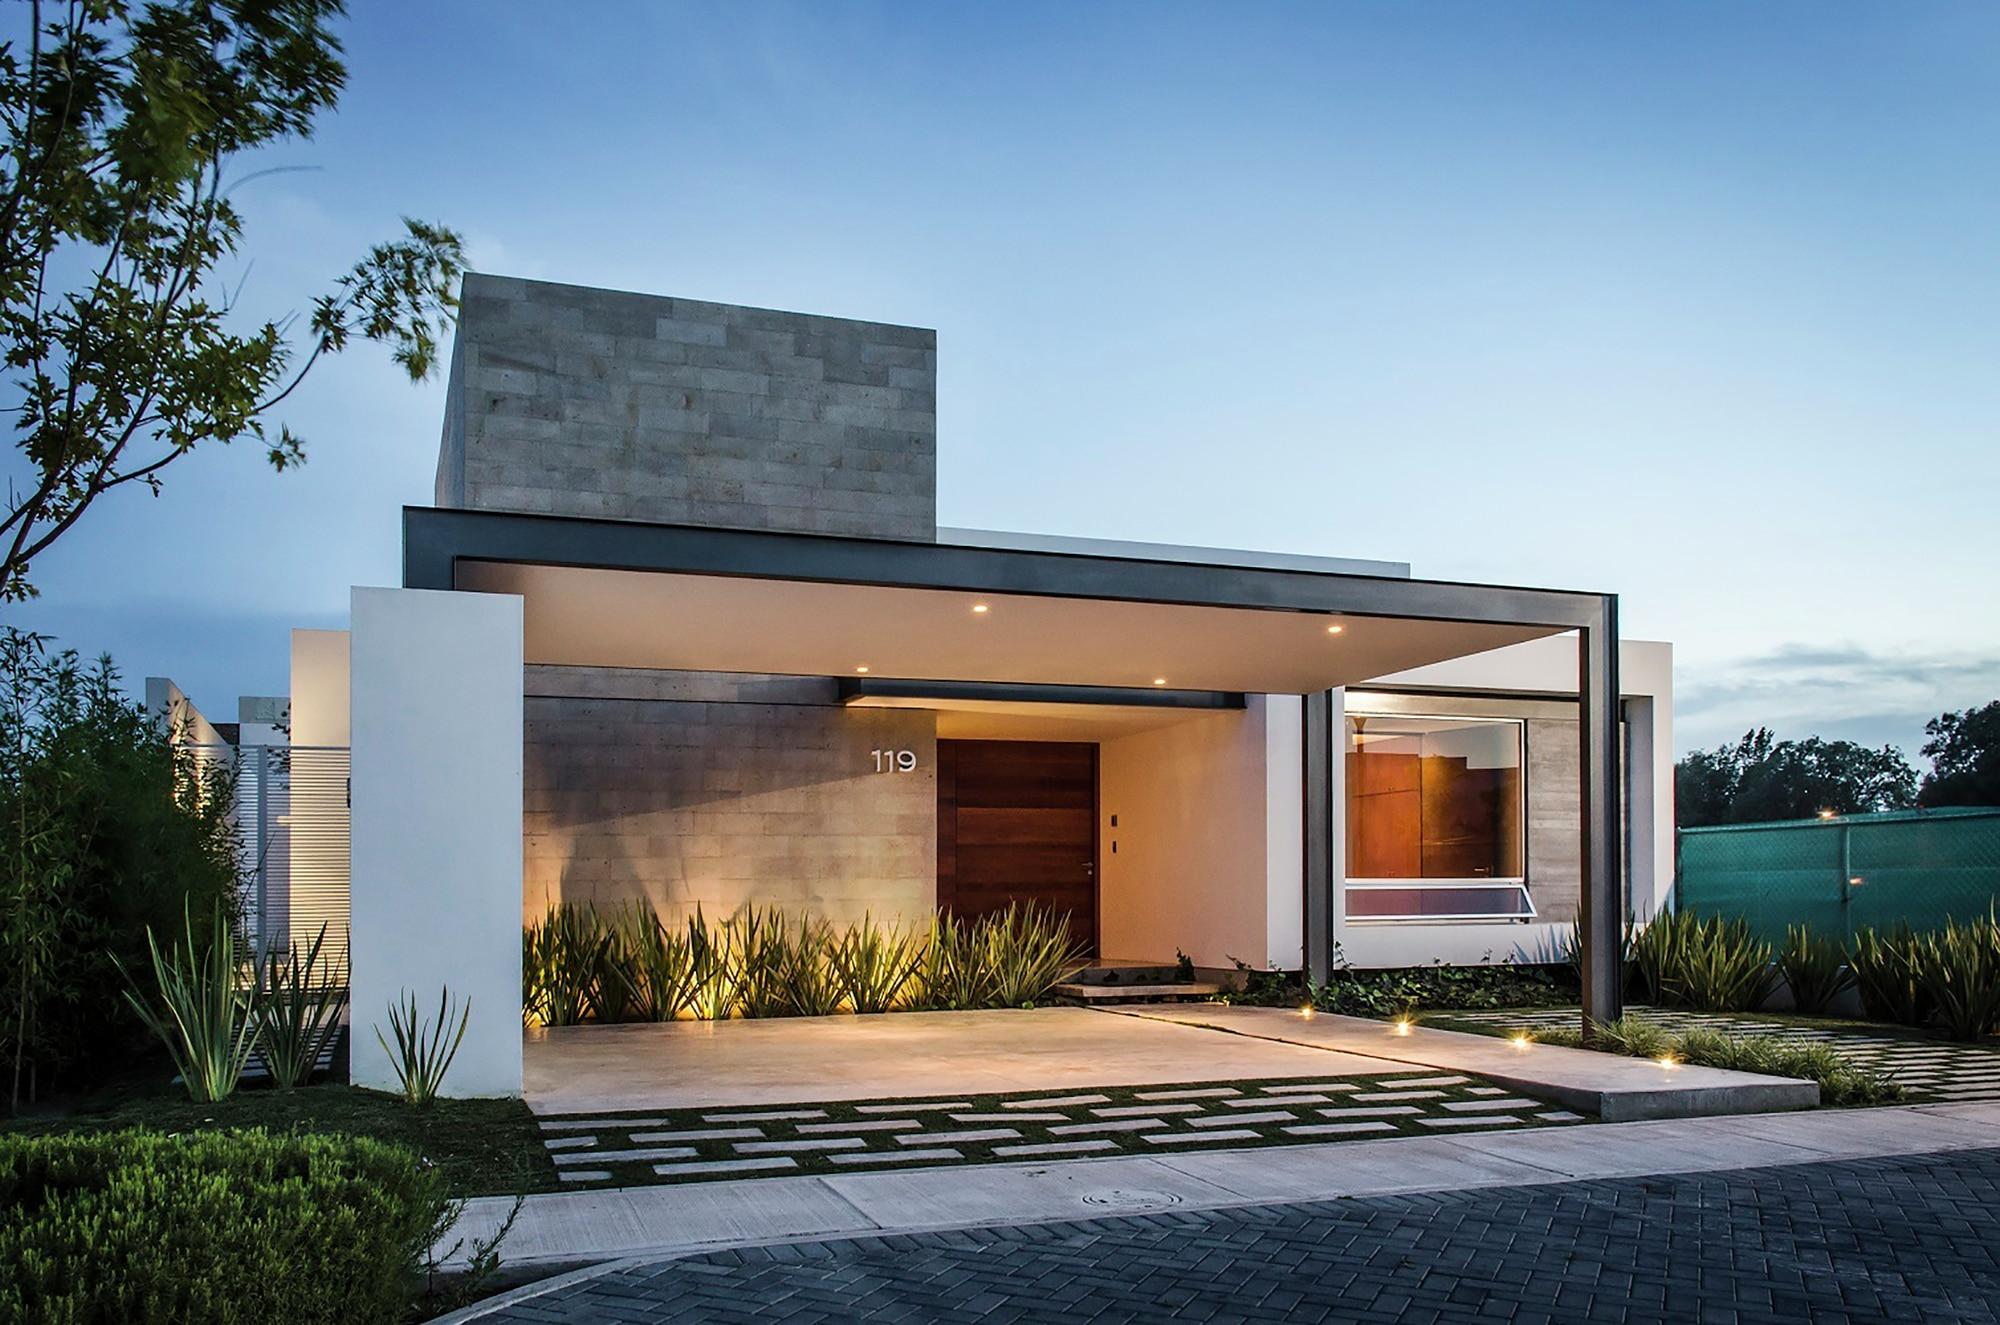 Dise o casa moderna de un piso construye hogar - Casa al rustico ...